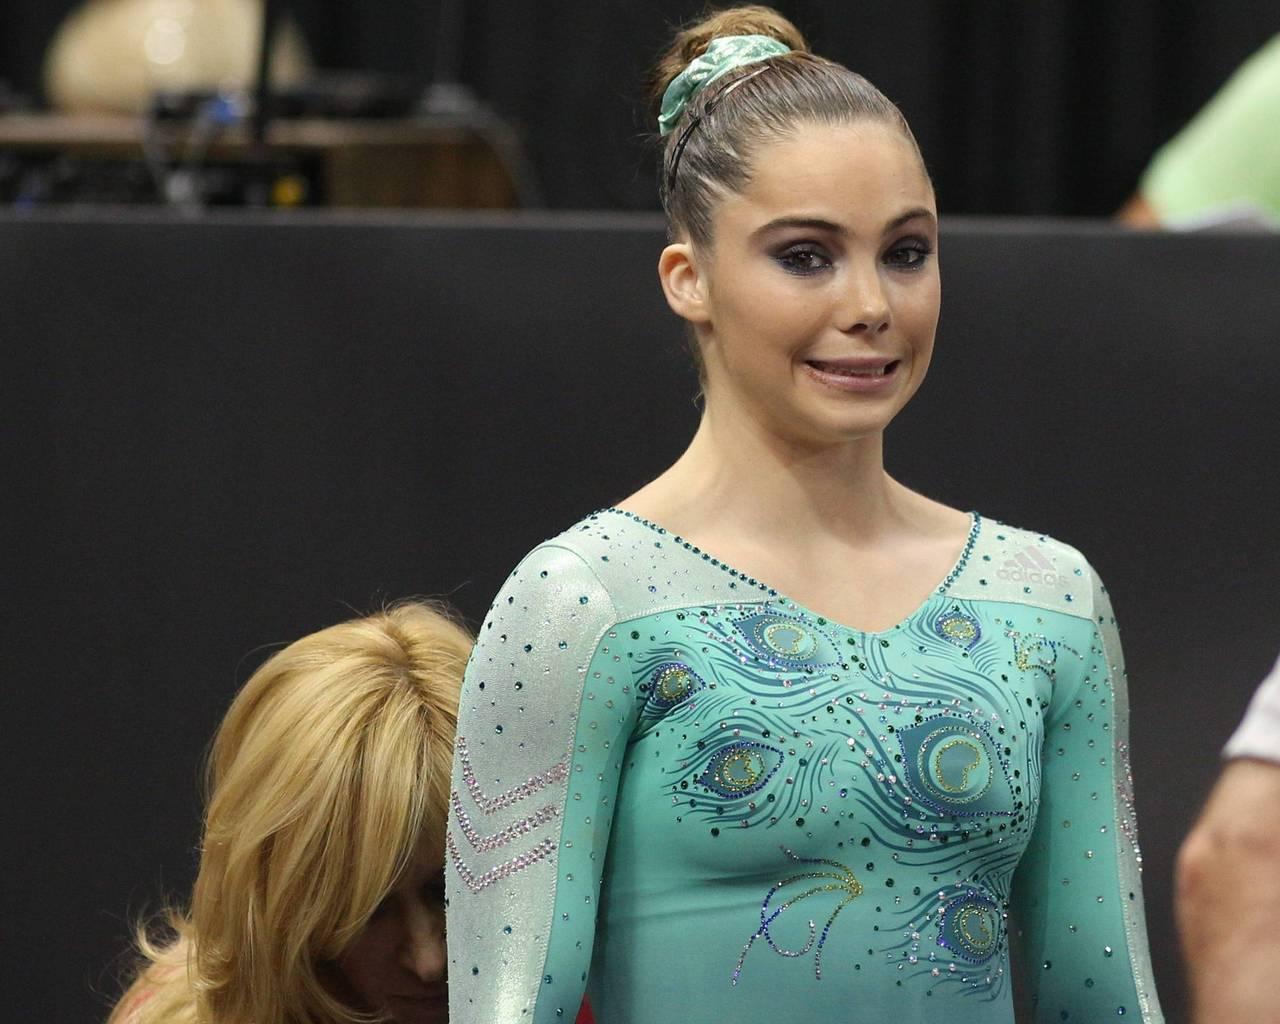 Olympic Gold Medalist McKayla Maroney Is Leaving Gymnastics